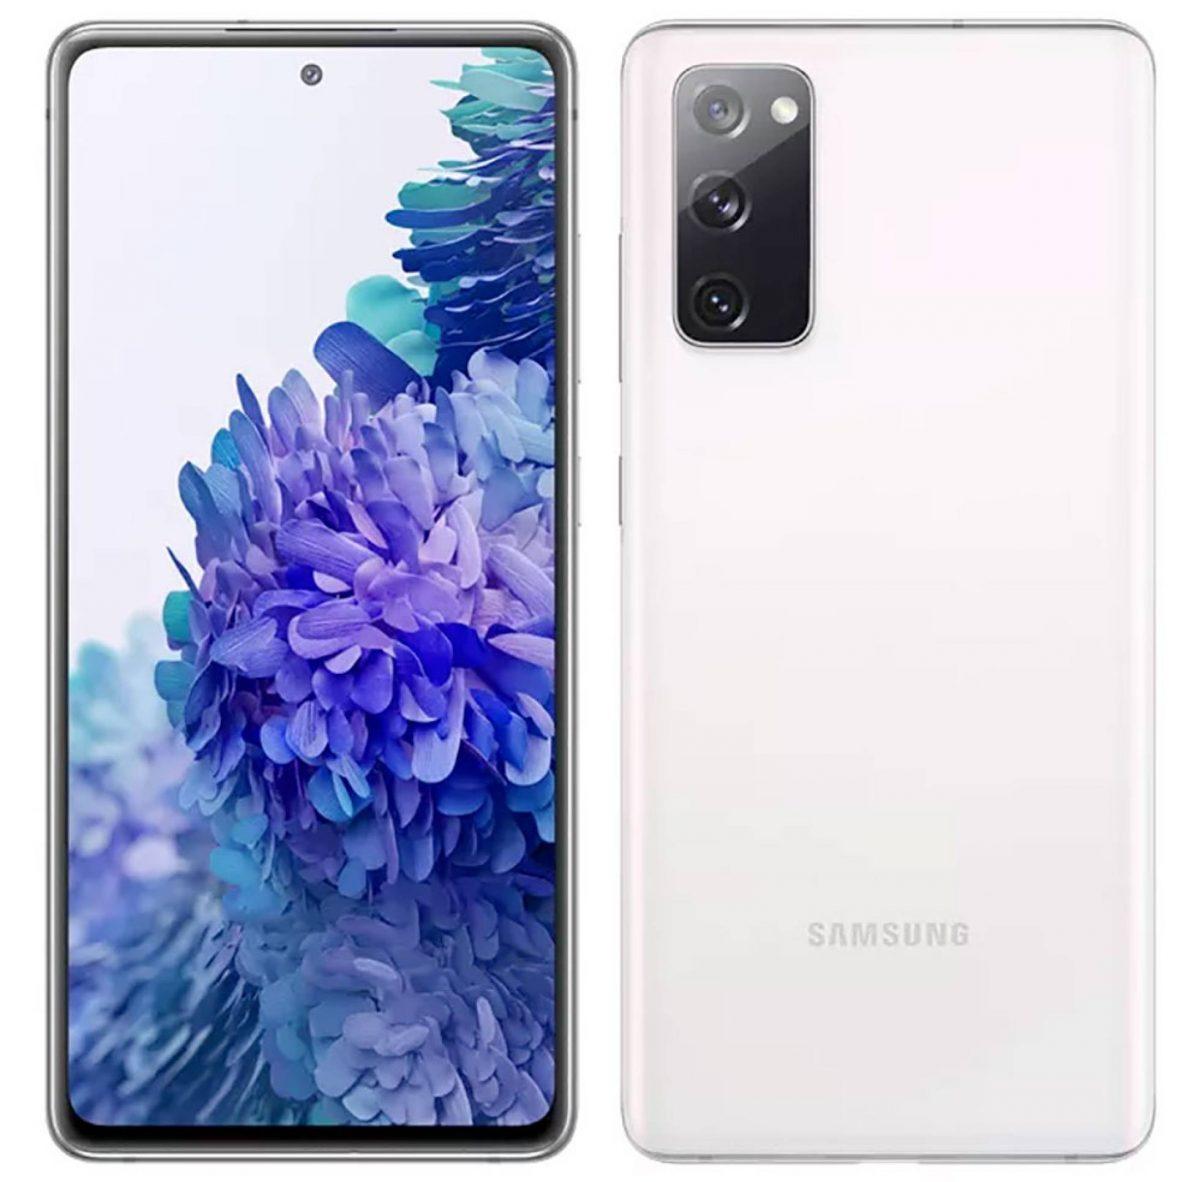 Samsung Galaxy S20 Fan Edition scaled SuperChollos